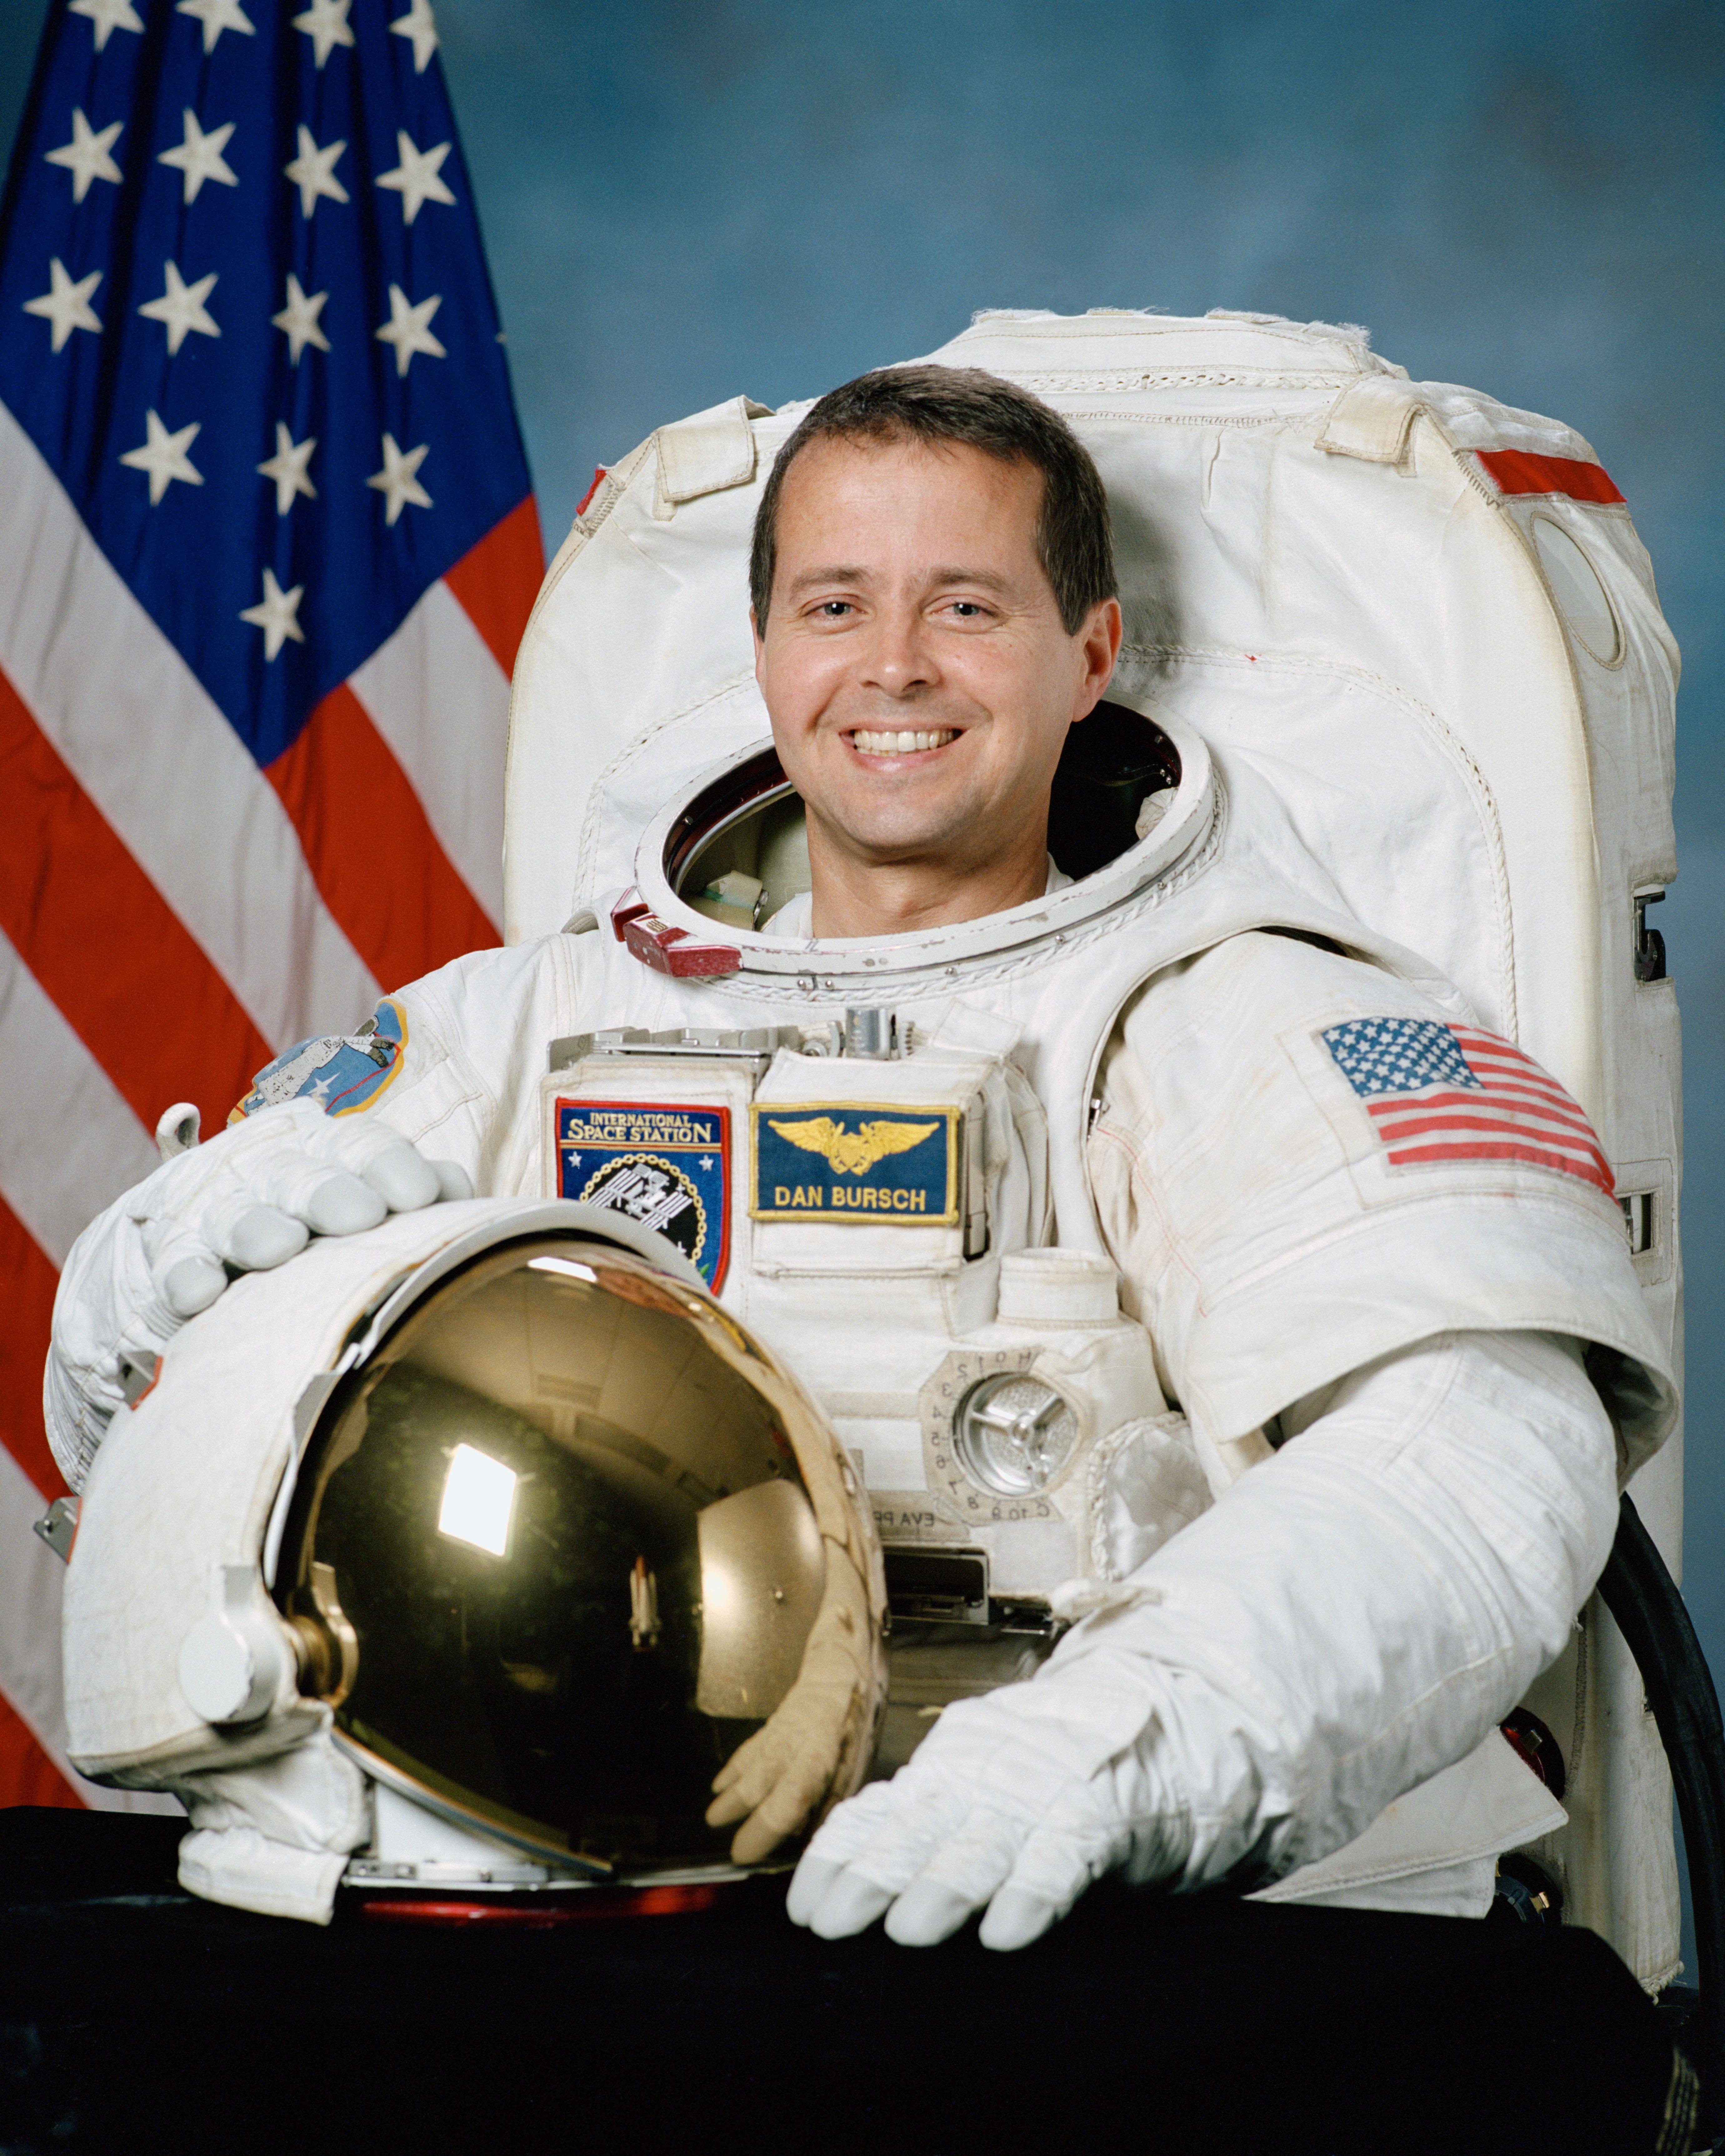 Dan Bursch Astronaut